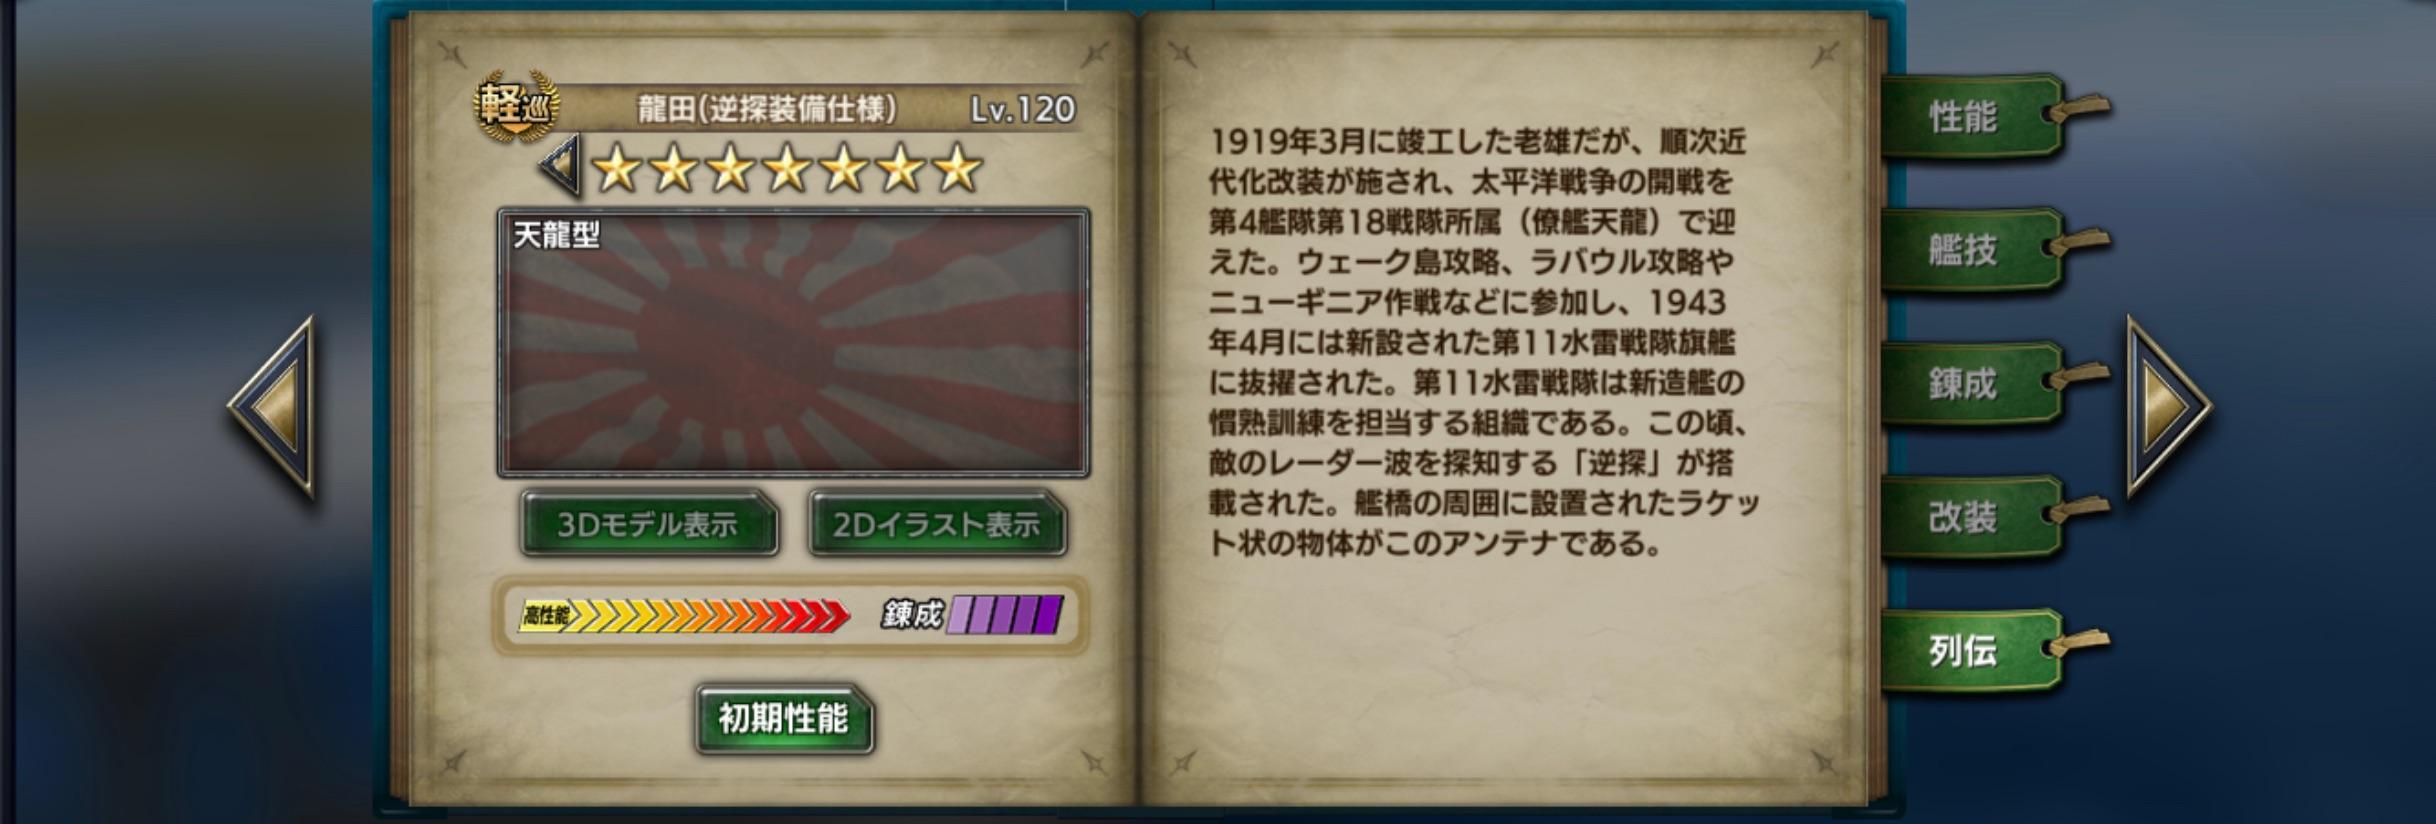 TatsutaR-history